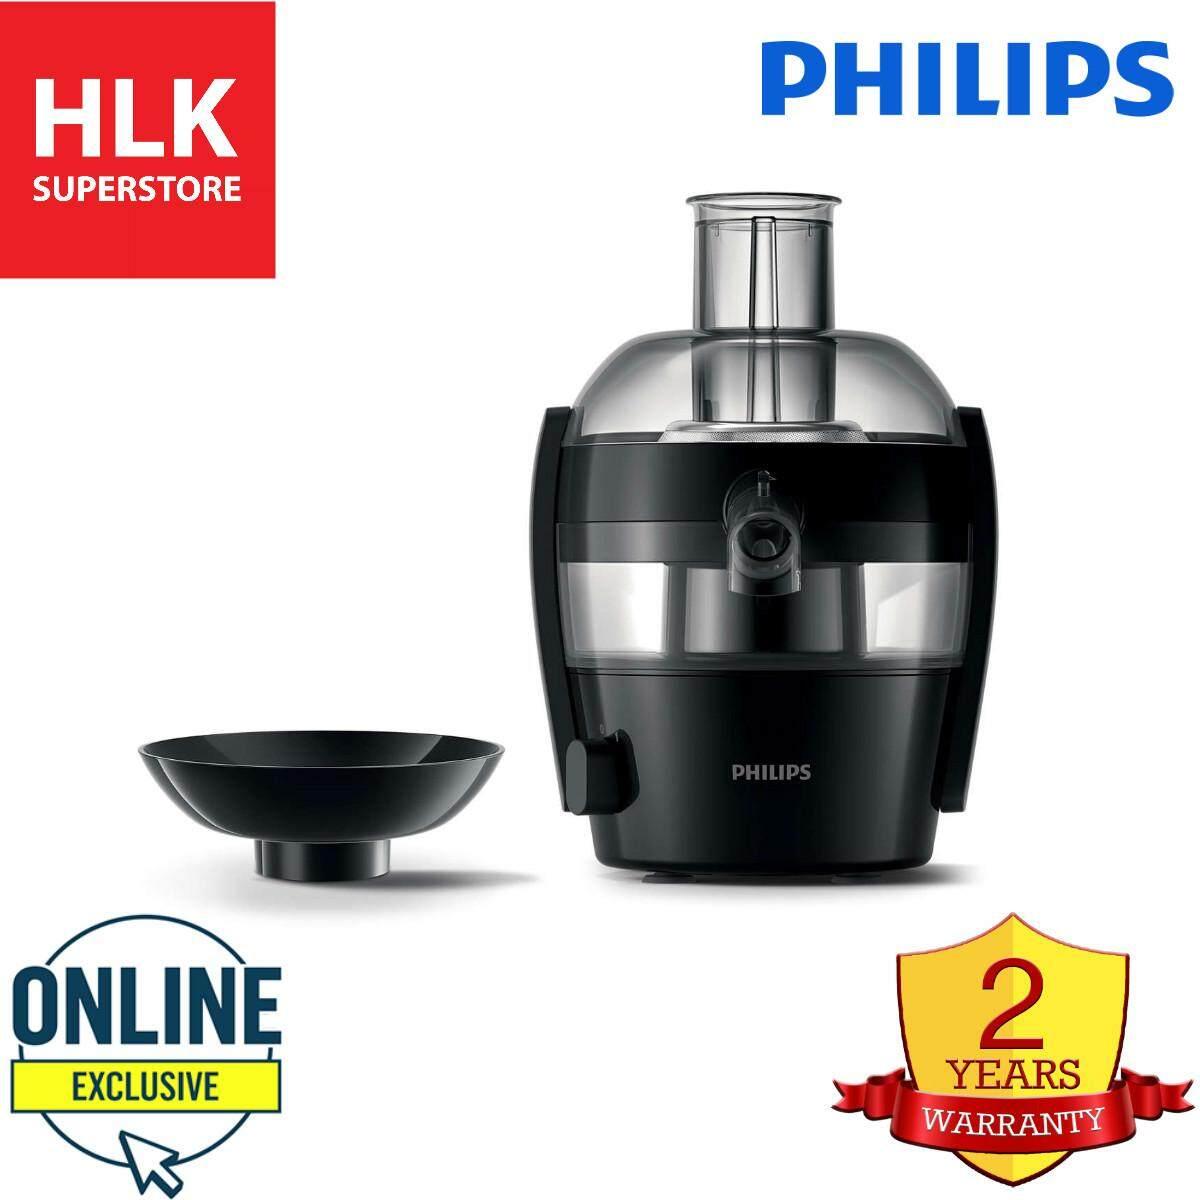 Philips Viva Collection 1.5L 500W Juice Extractor Black HR1833